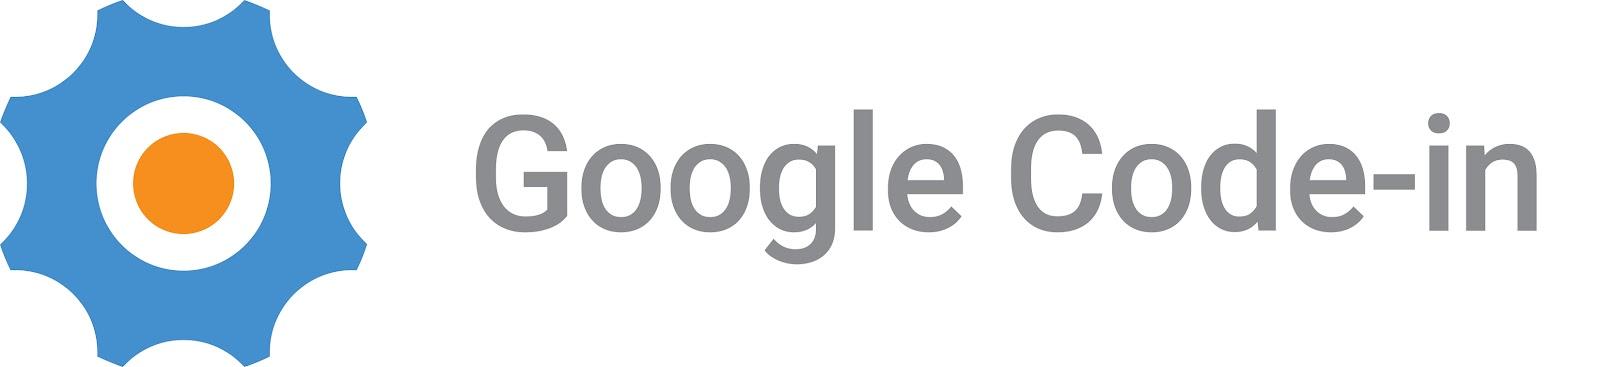 GCI 2015 logo.jpg